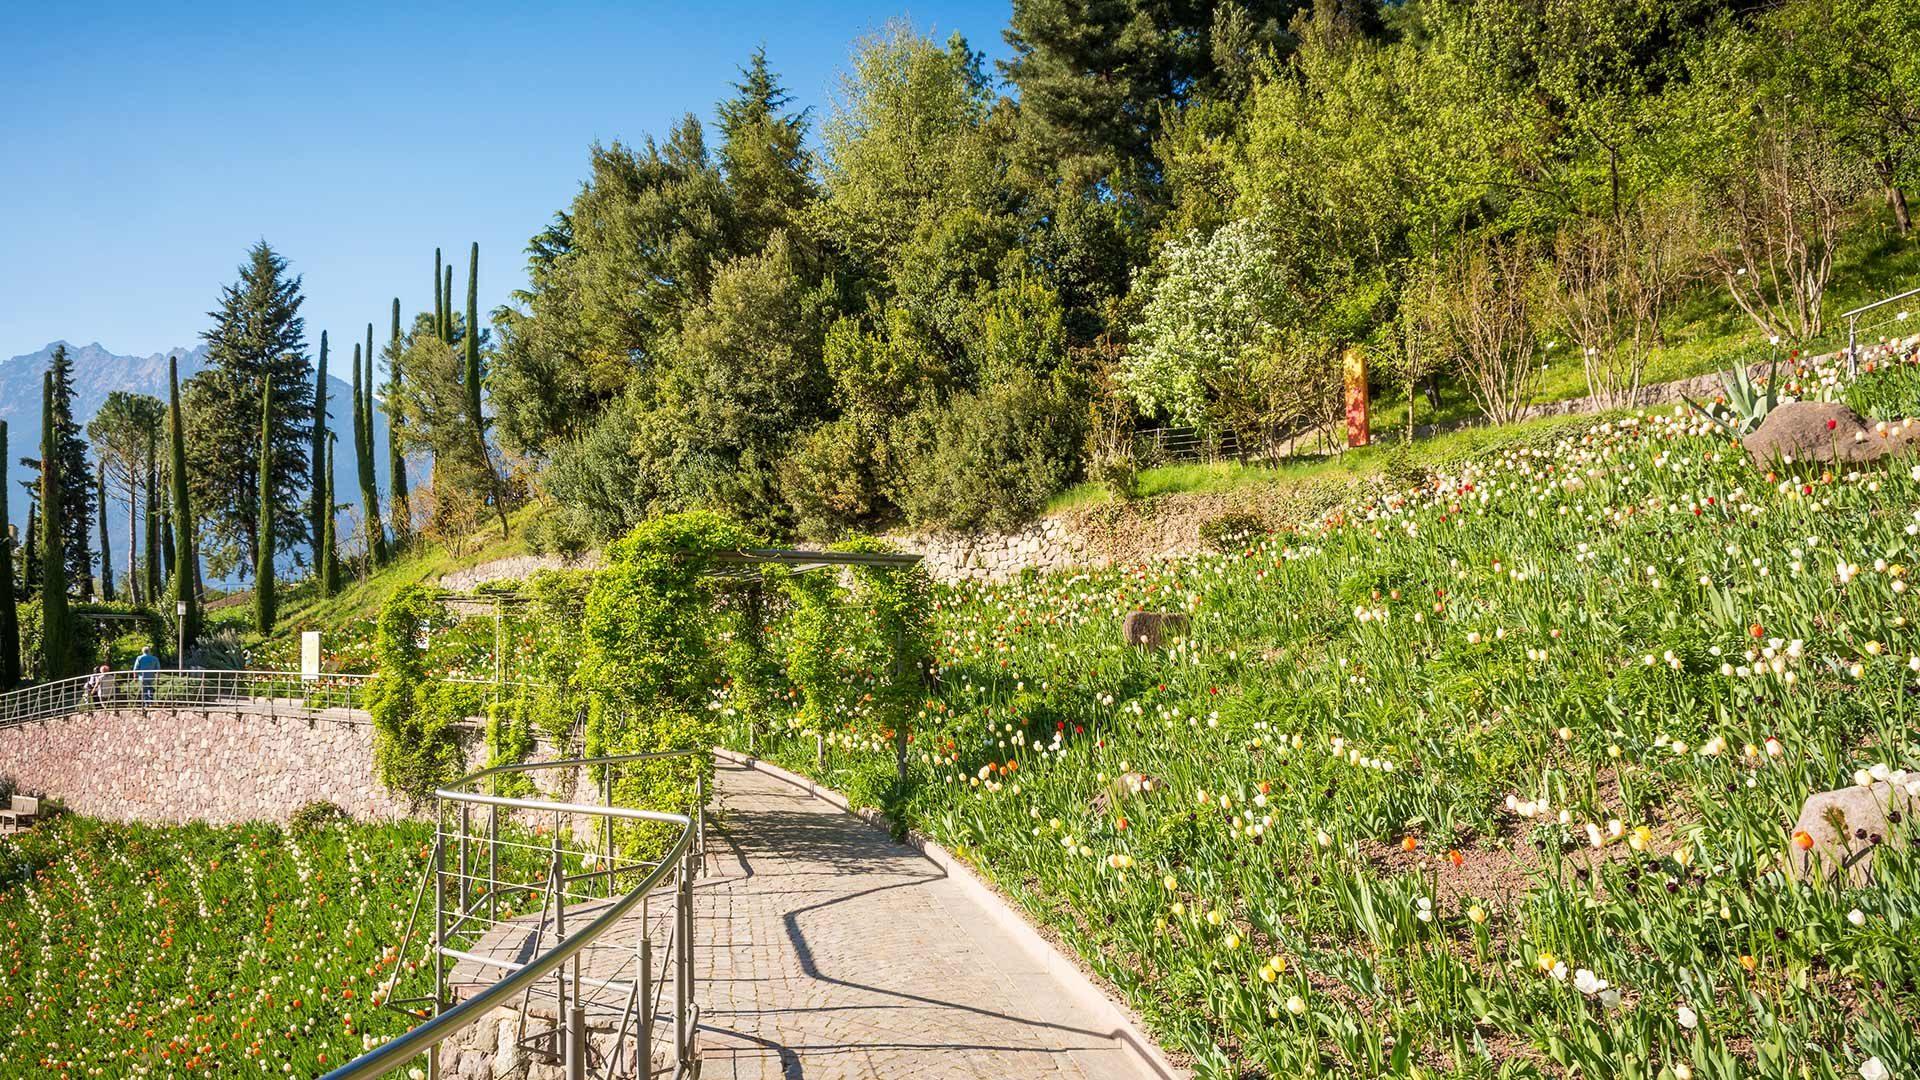 Prato dei tulipani - Giardini di Castel Trauttmansdorff